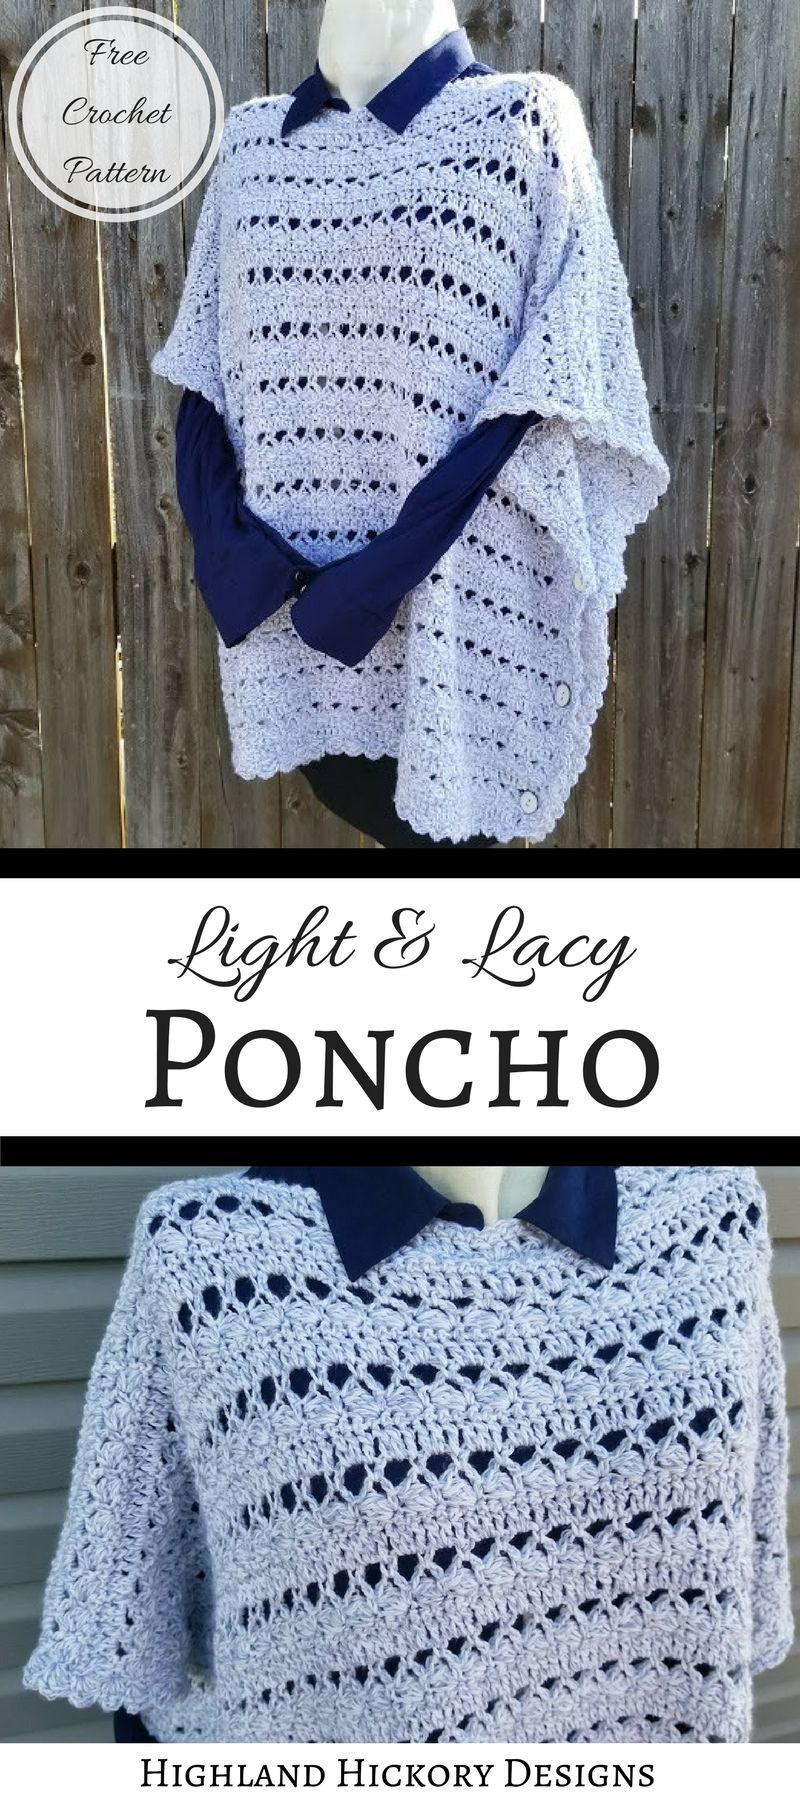 Light & Lacy Poncho | Pinterest | Crochet poncho, Crochet and Ponchos